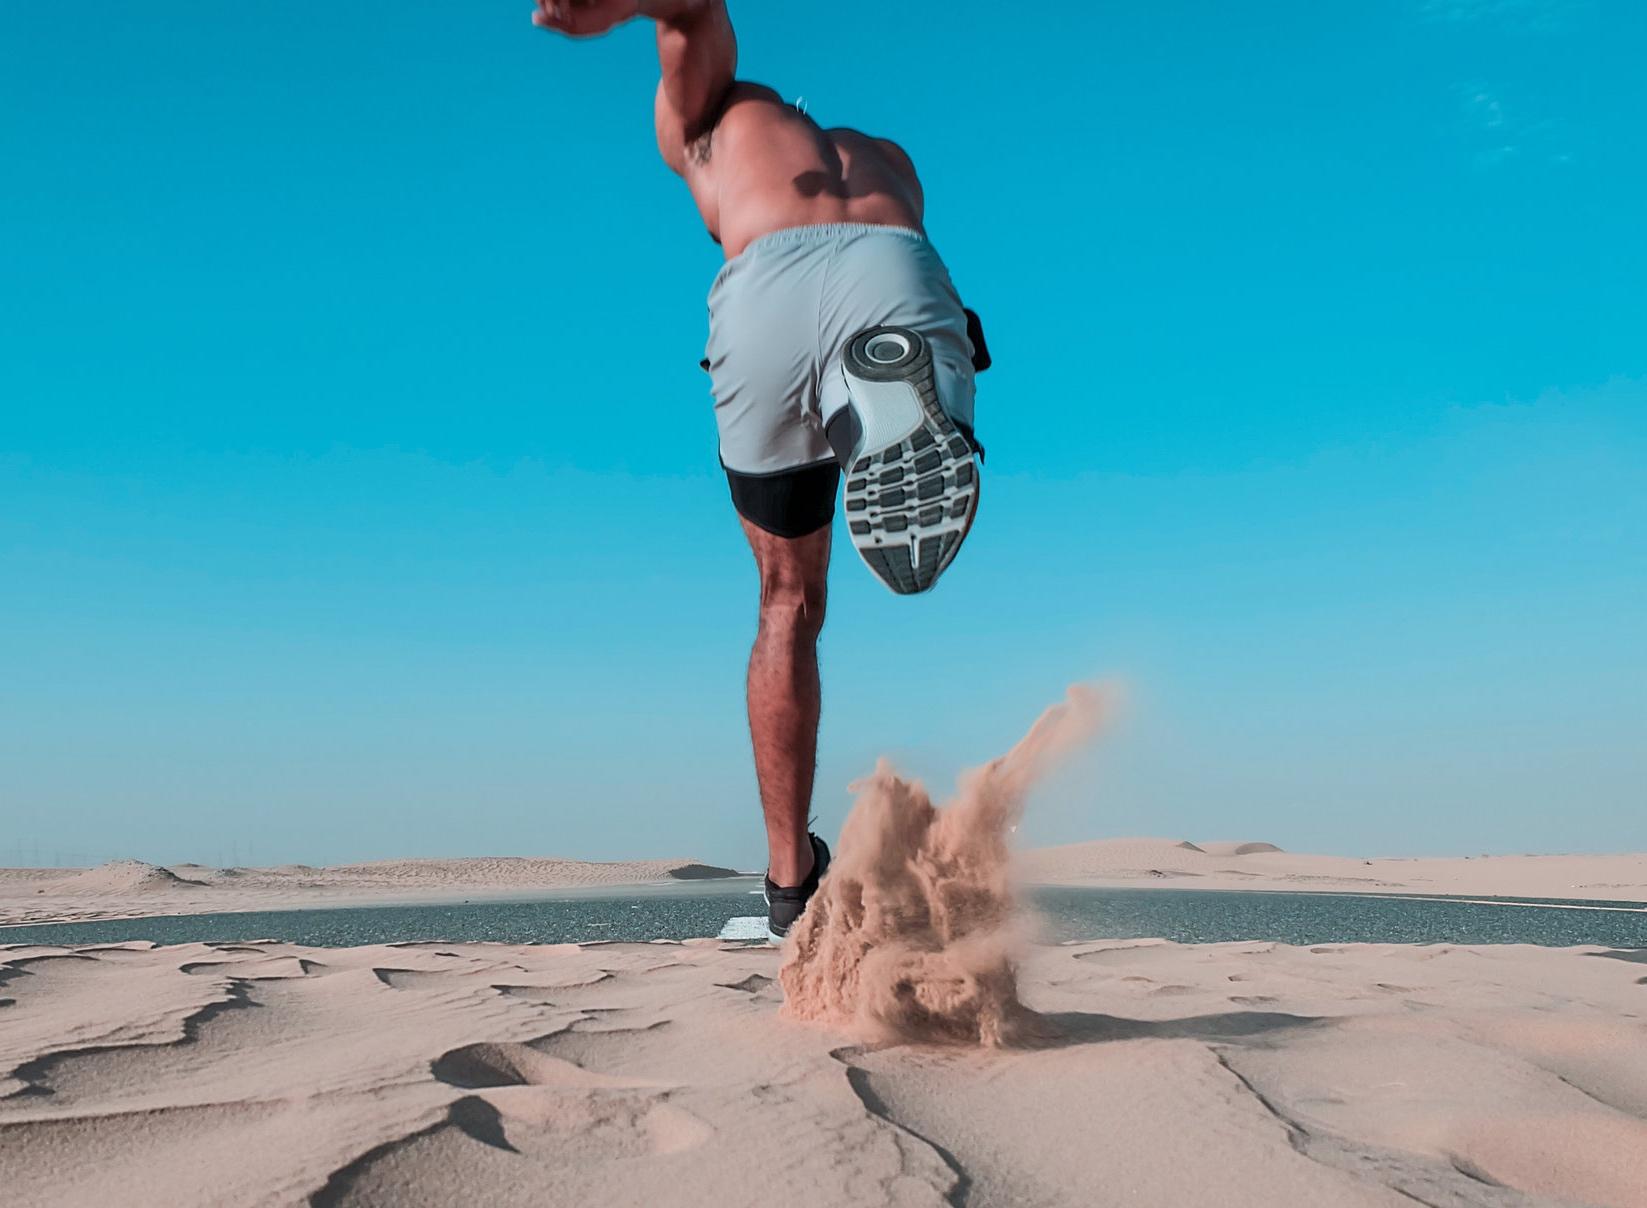 Canva+-+Man+Running+on+Sand.jpg